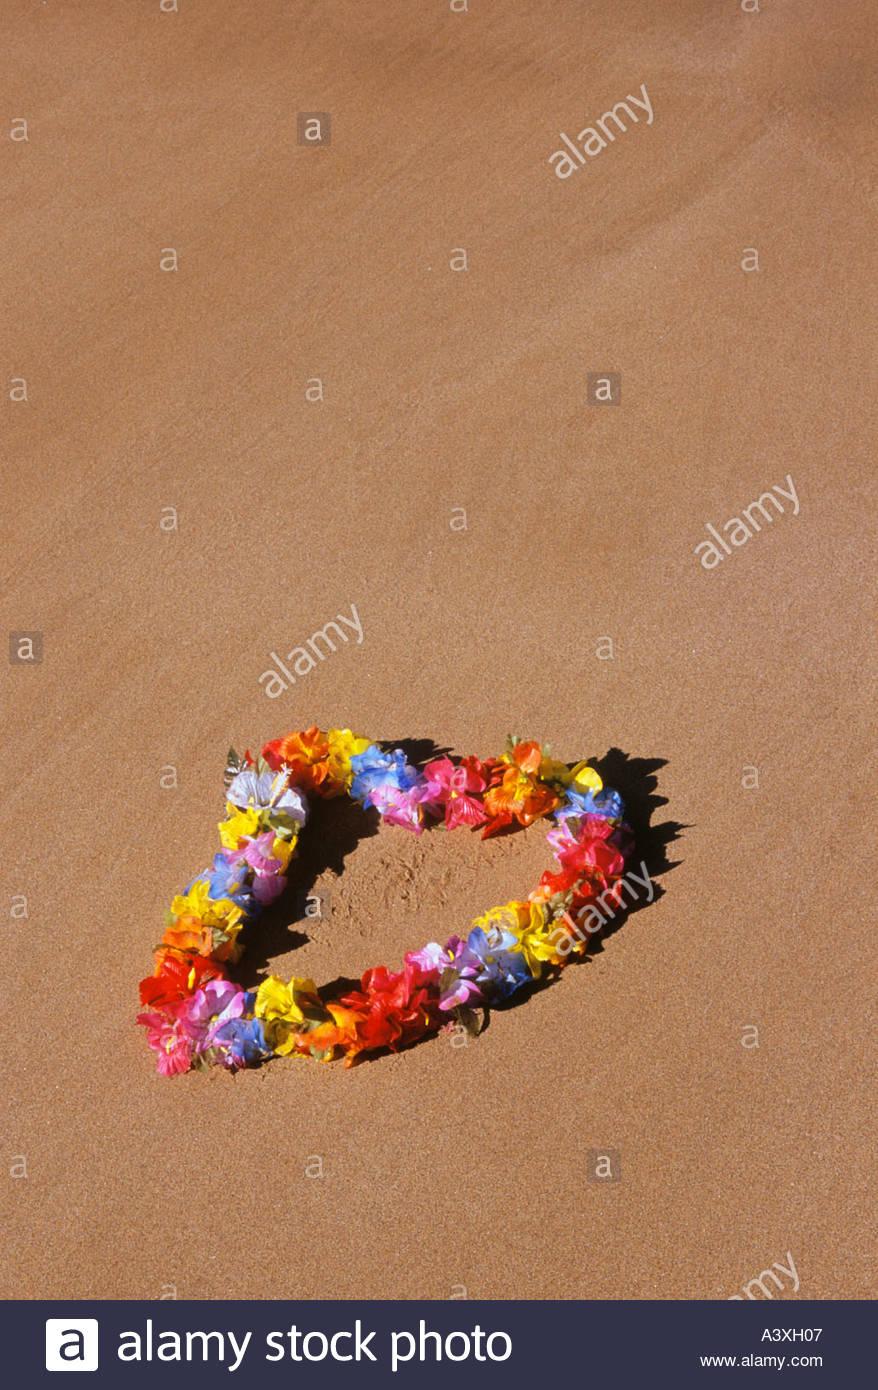 Flower garland or lei on the beach at wailea on the island of maui flower garland or lei on the beach at wailea on the island of maui in the state of hawaii usa izmirmasajfo